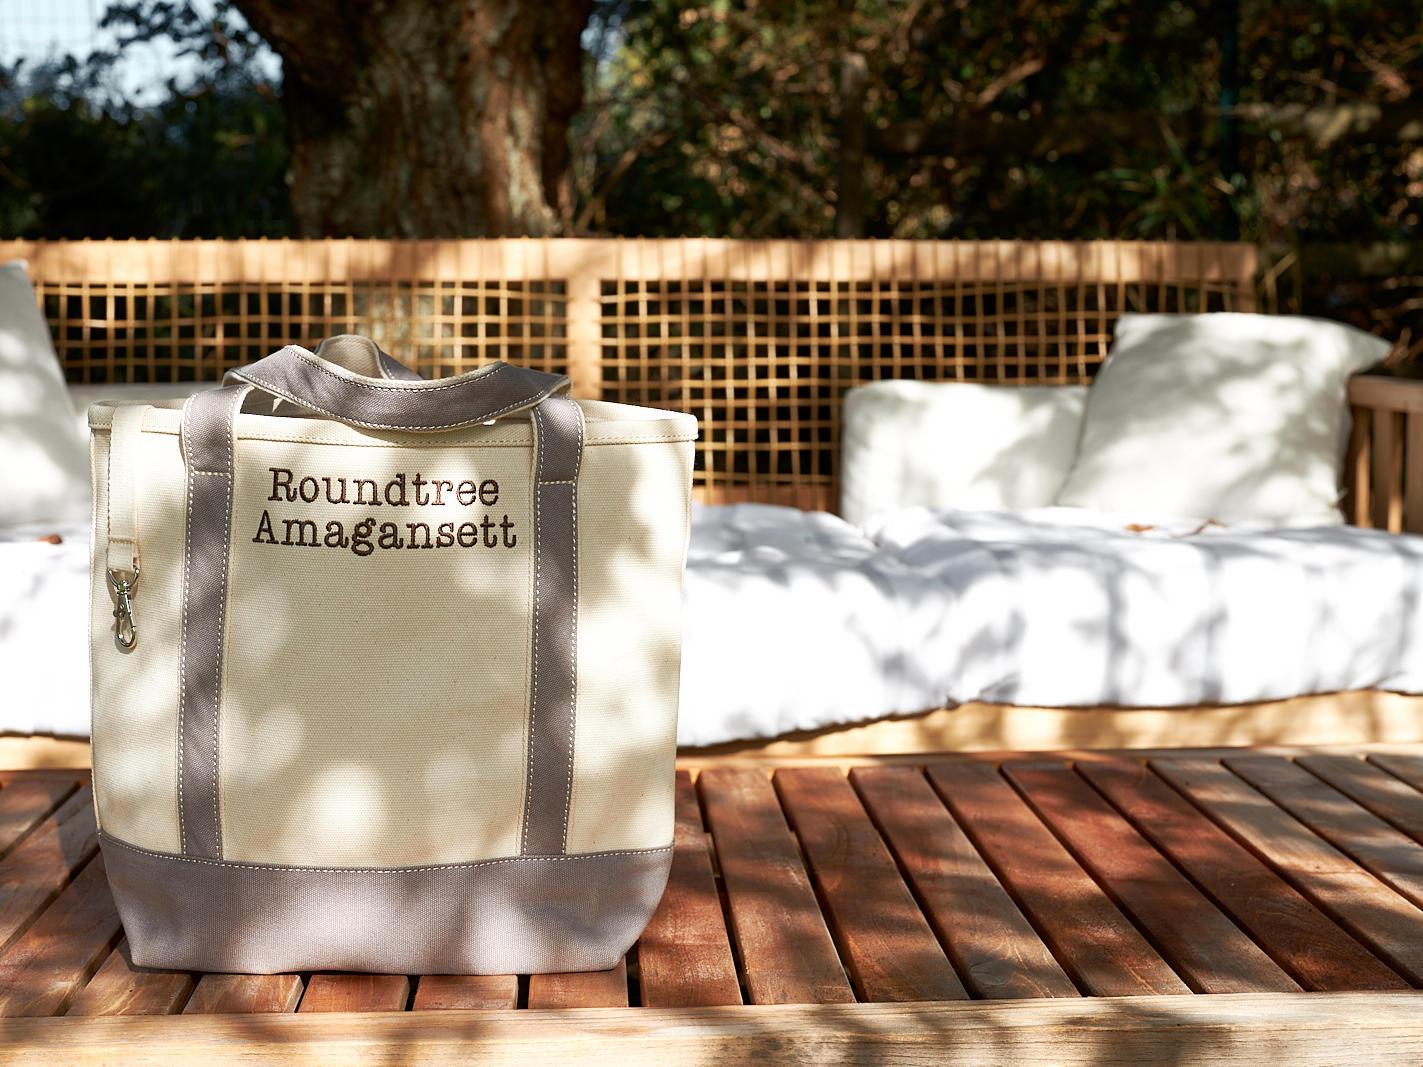 Beach Essentials, The Roundtree, Amagansett, Hotel in Hamptons